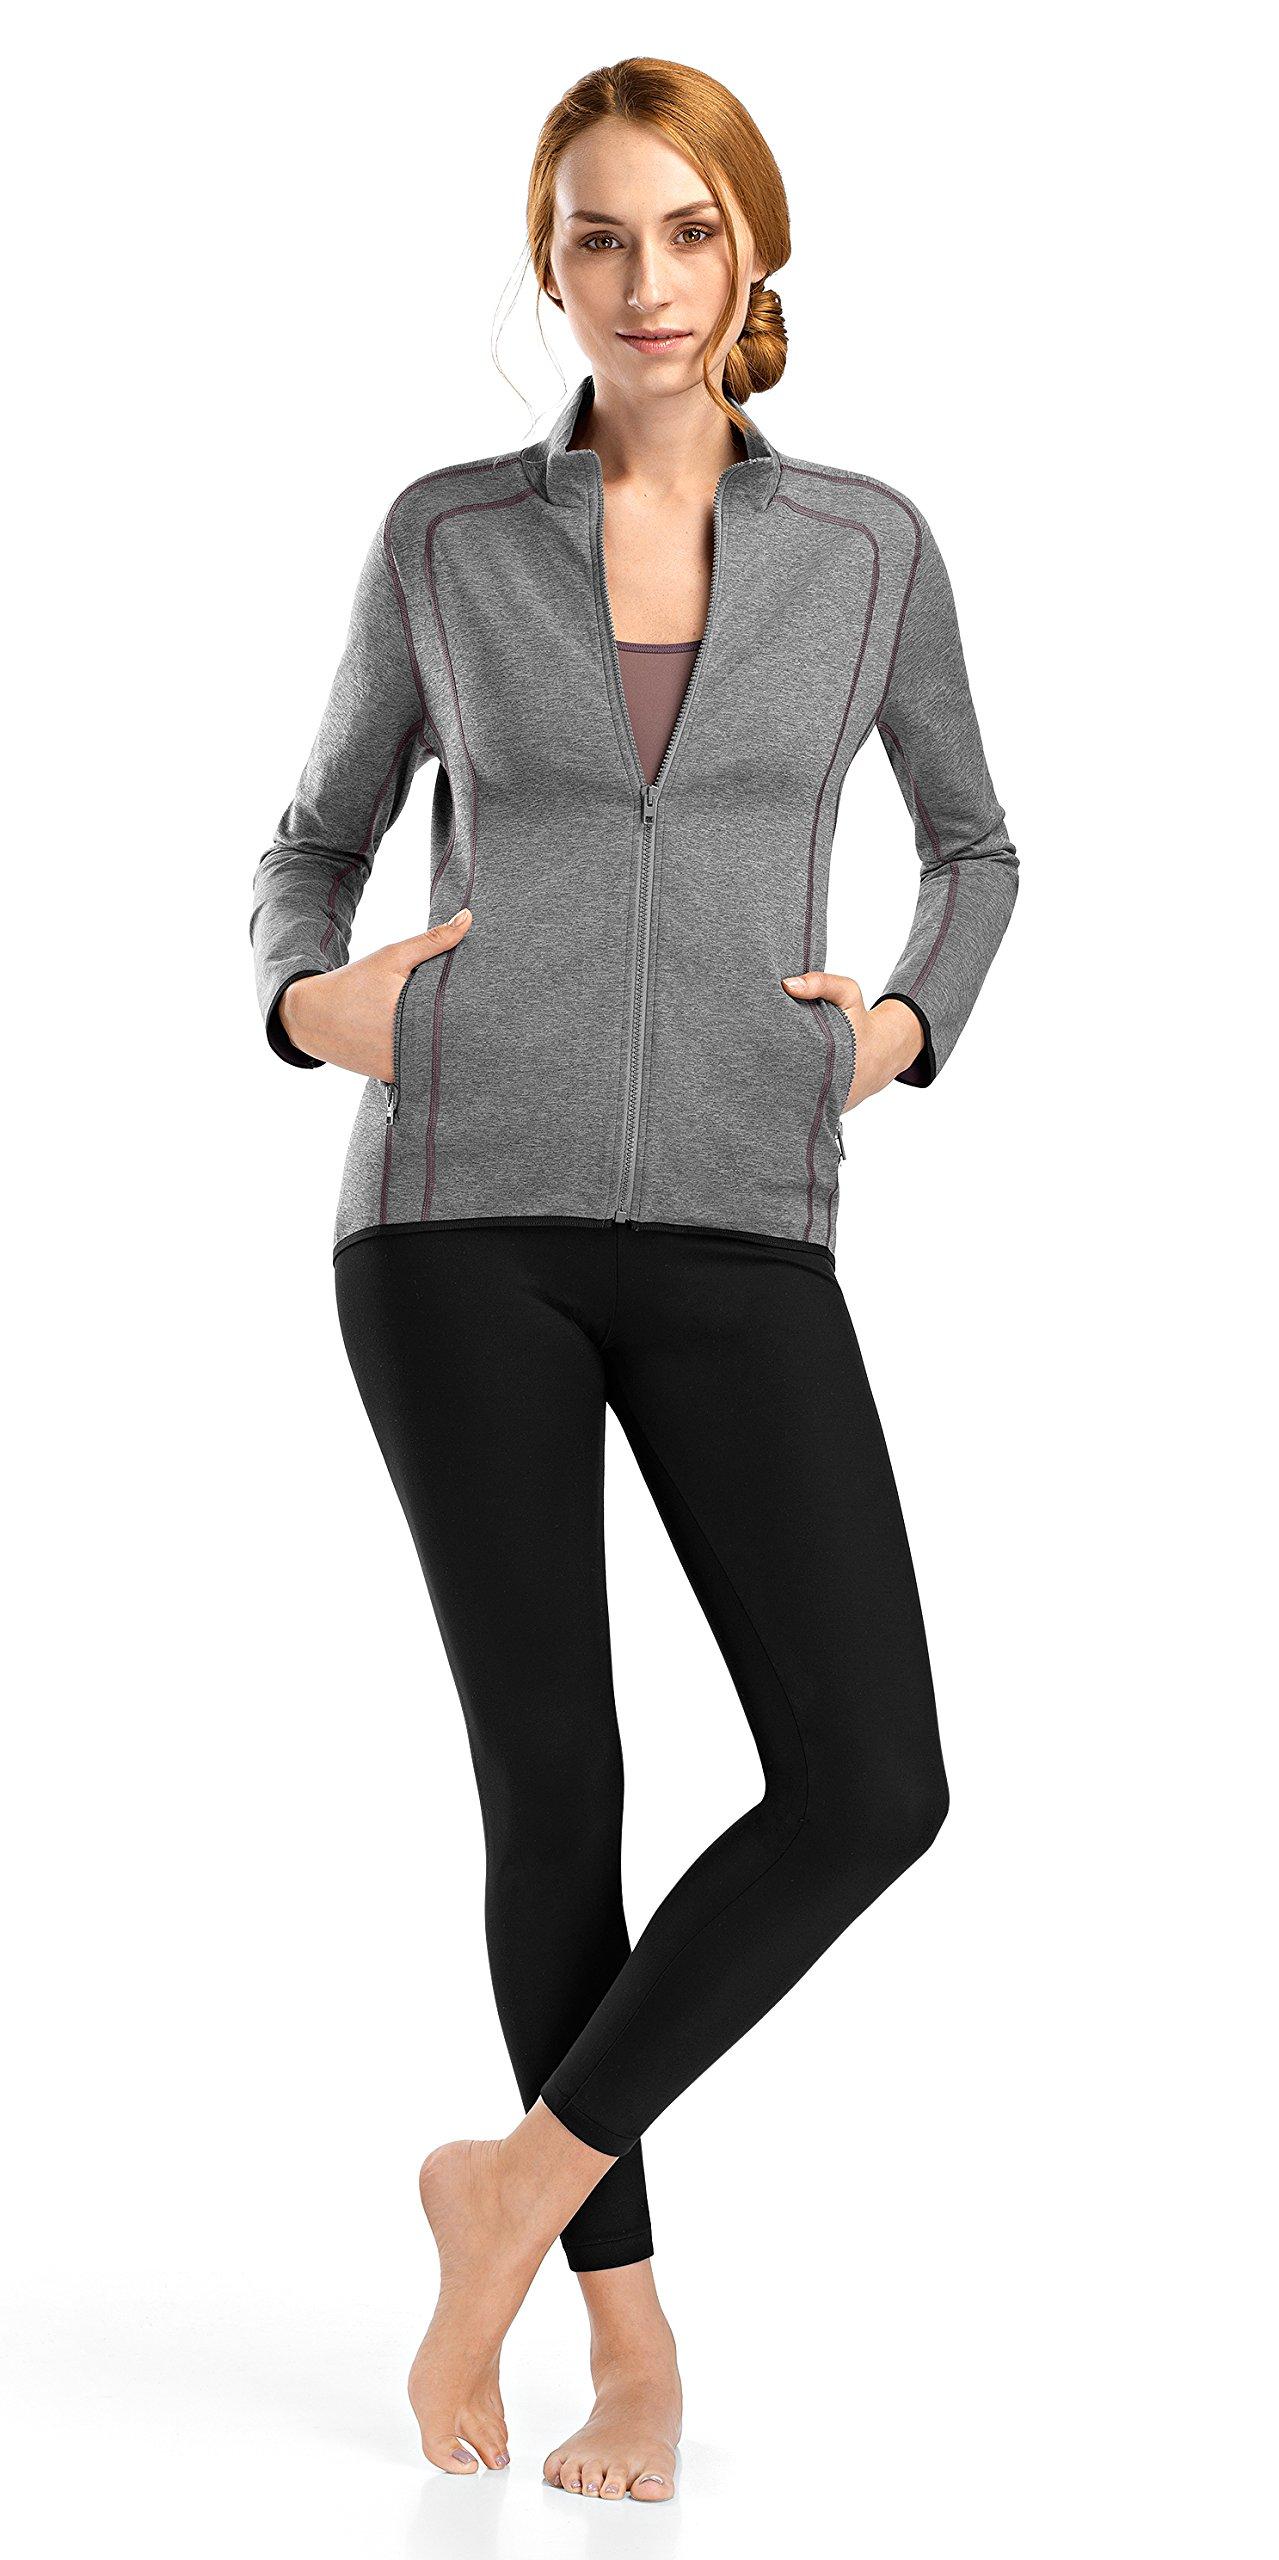 Hanro Women's Balance Zip Front Jacket, Carbon Melange, Large by HANRO